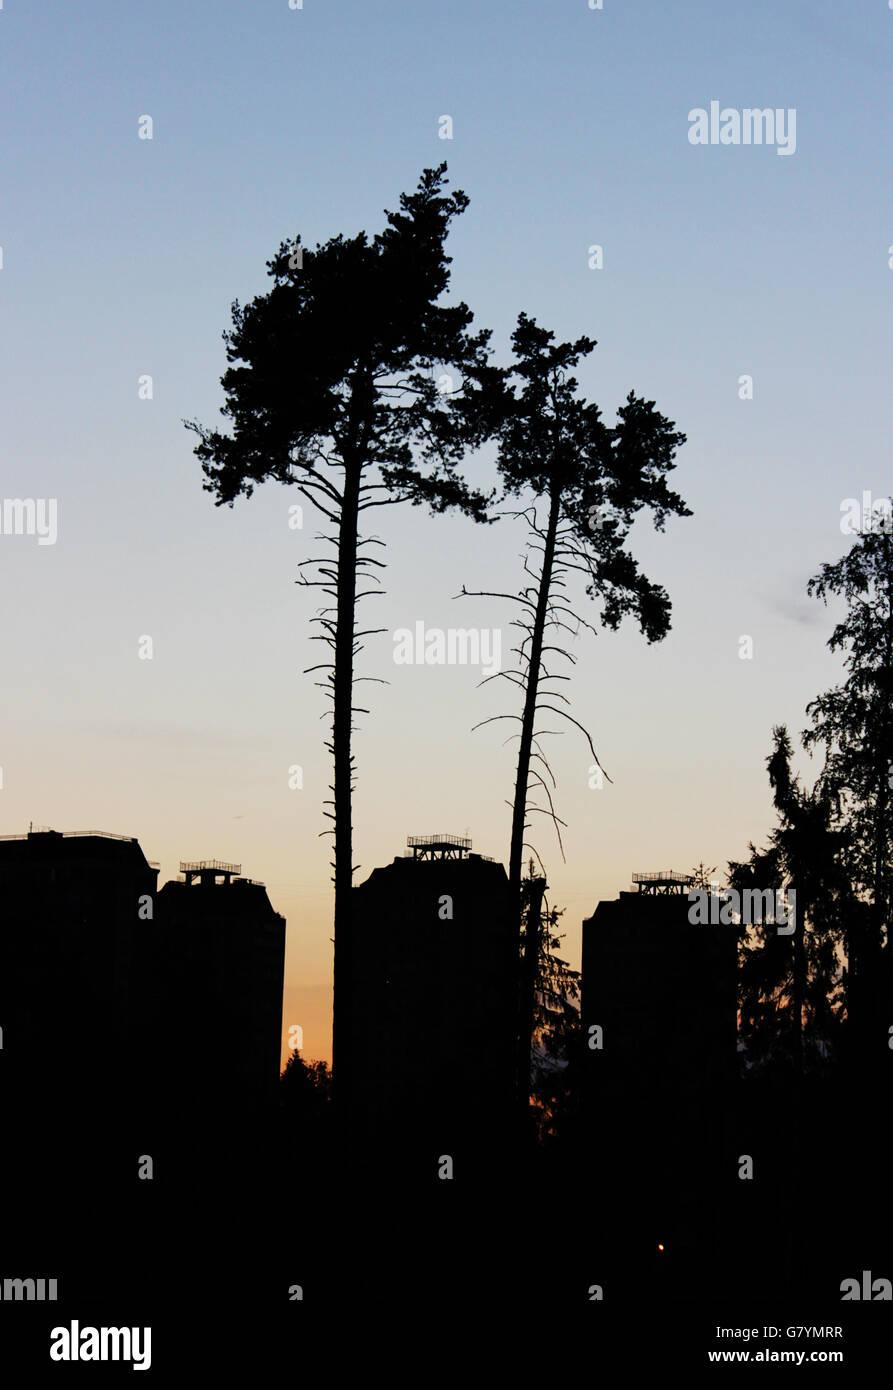 Naranja atardecer, dos pinos y tres casas de contorno Imagen De Stock